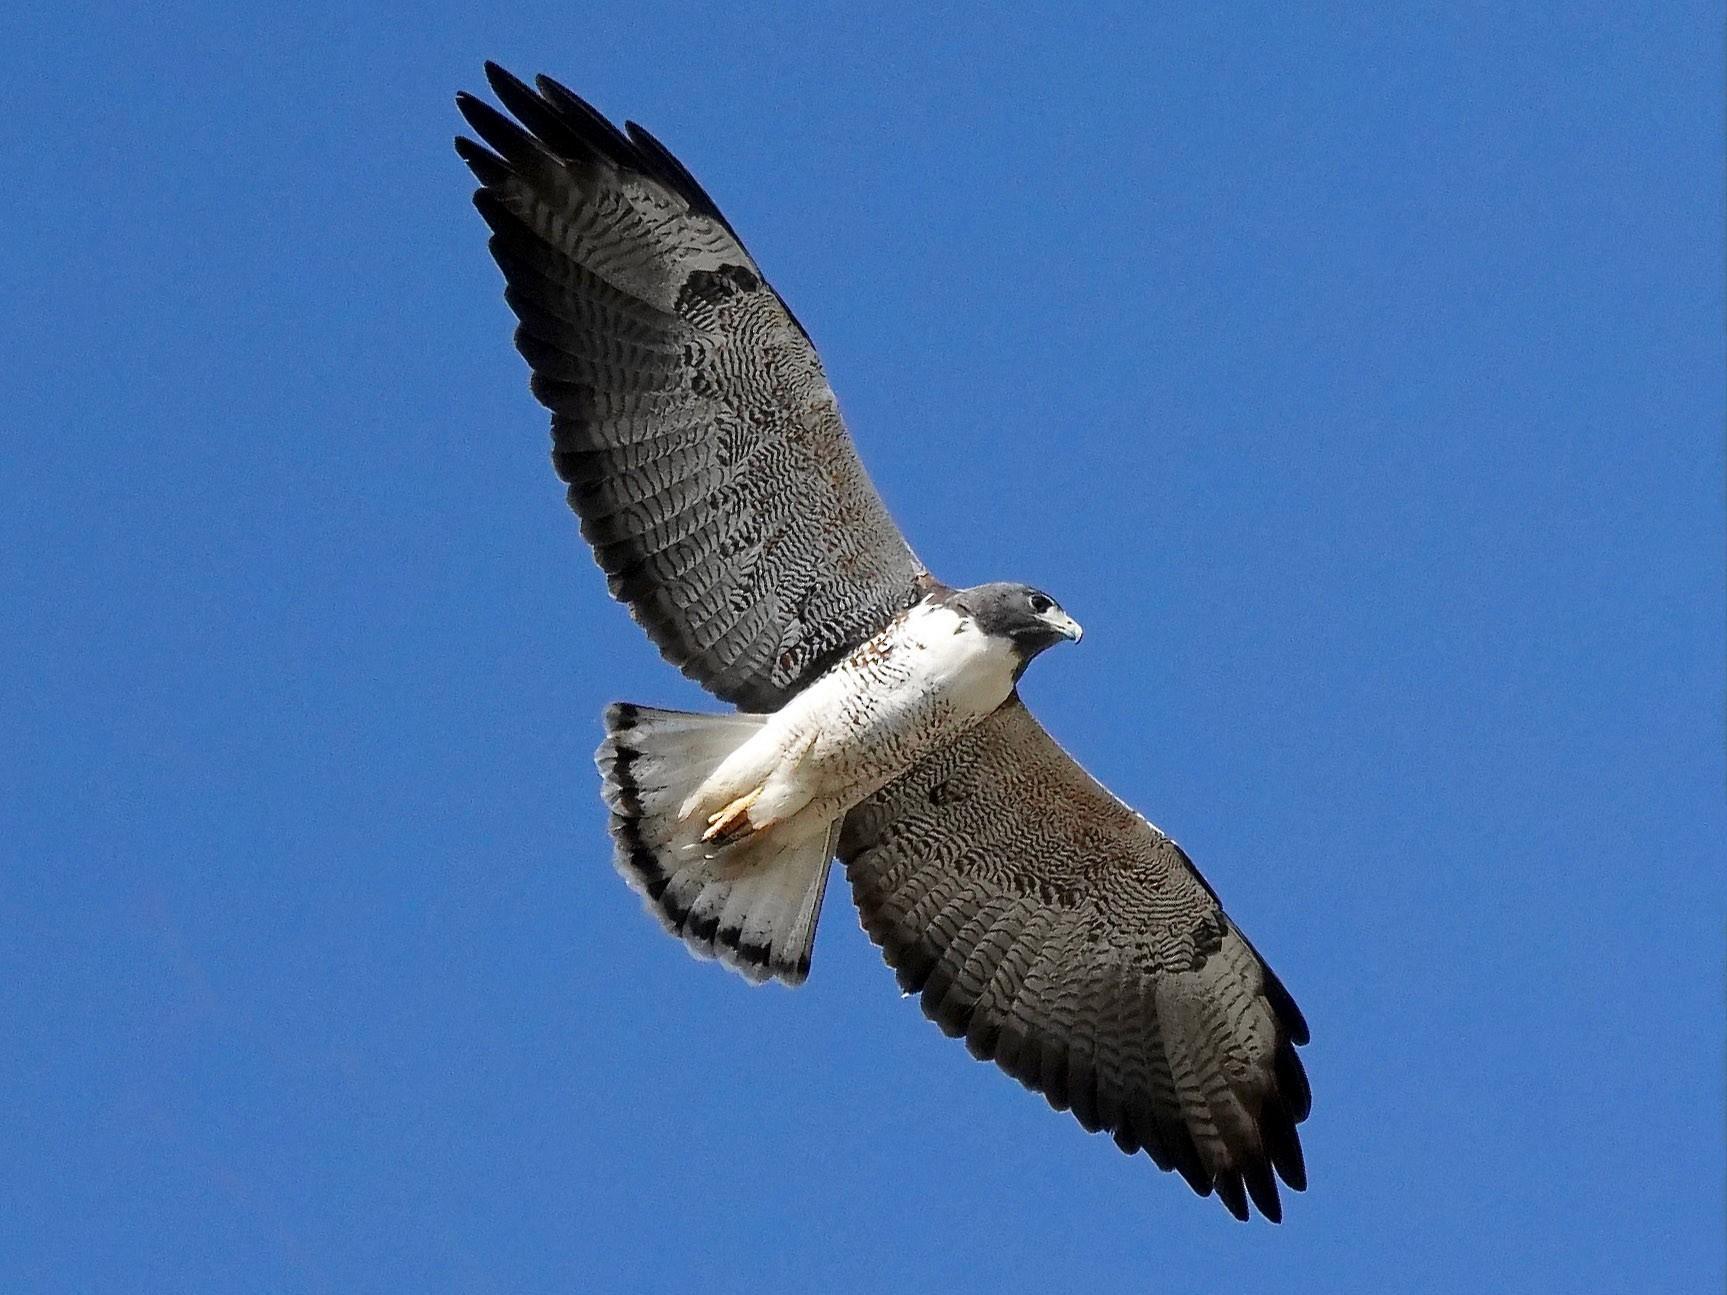 White-tailed Hawk - Sibylle Hechtel